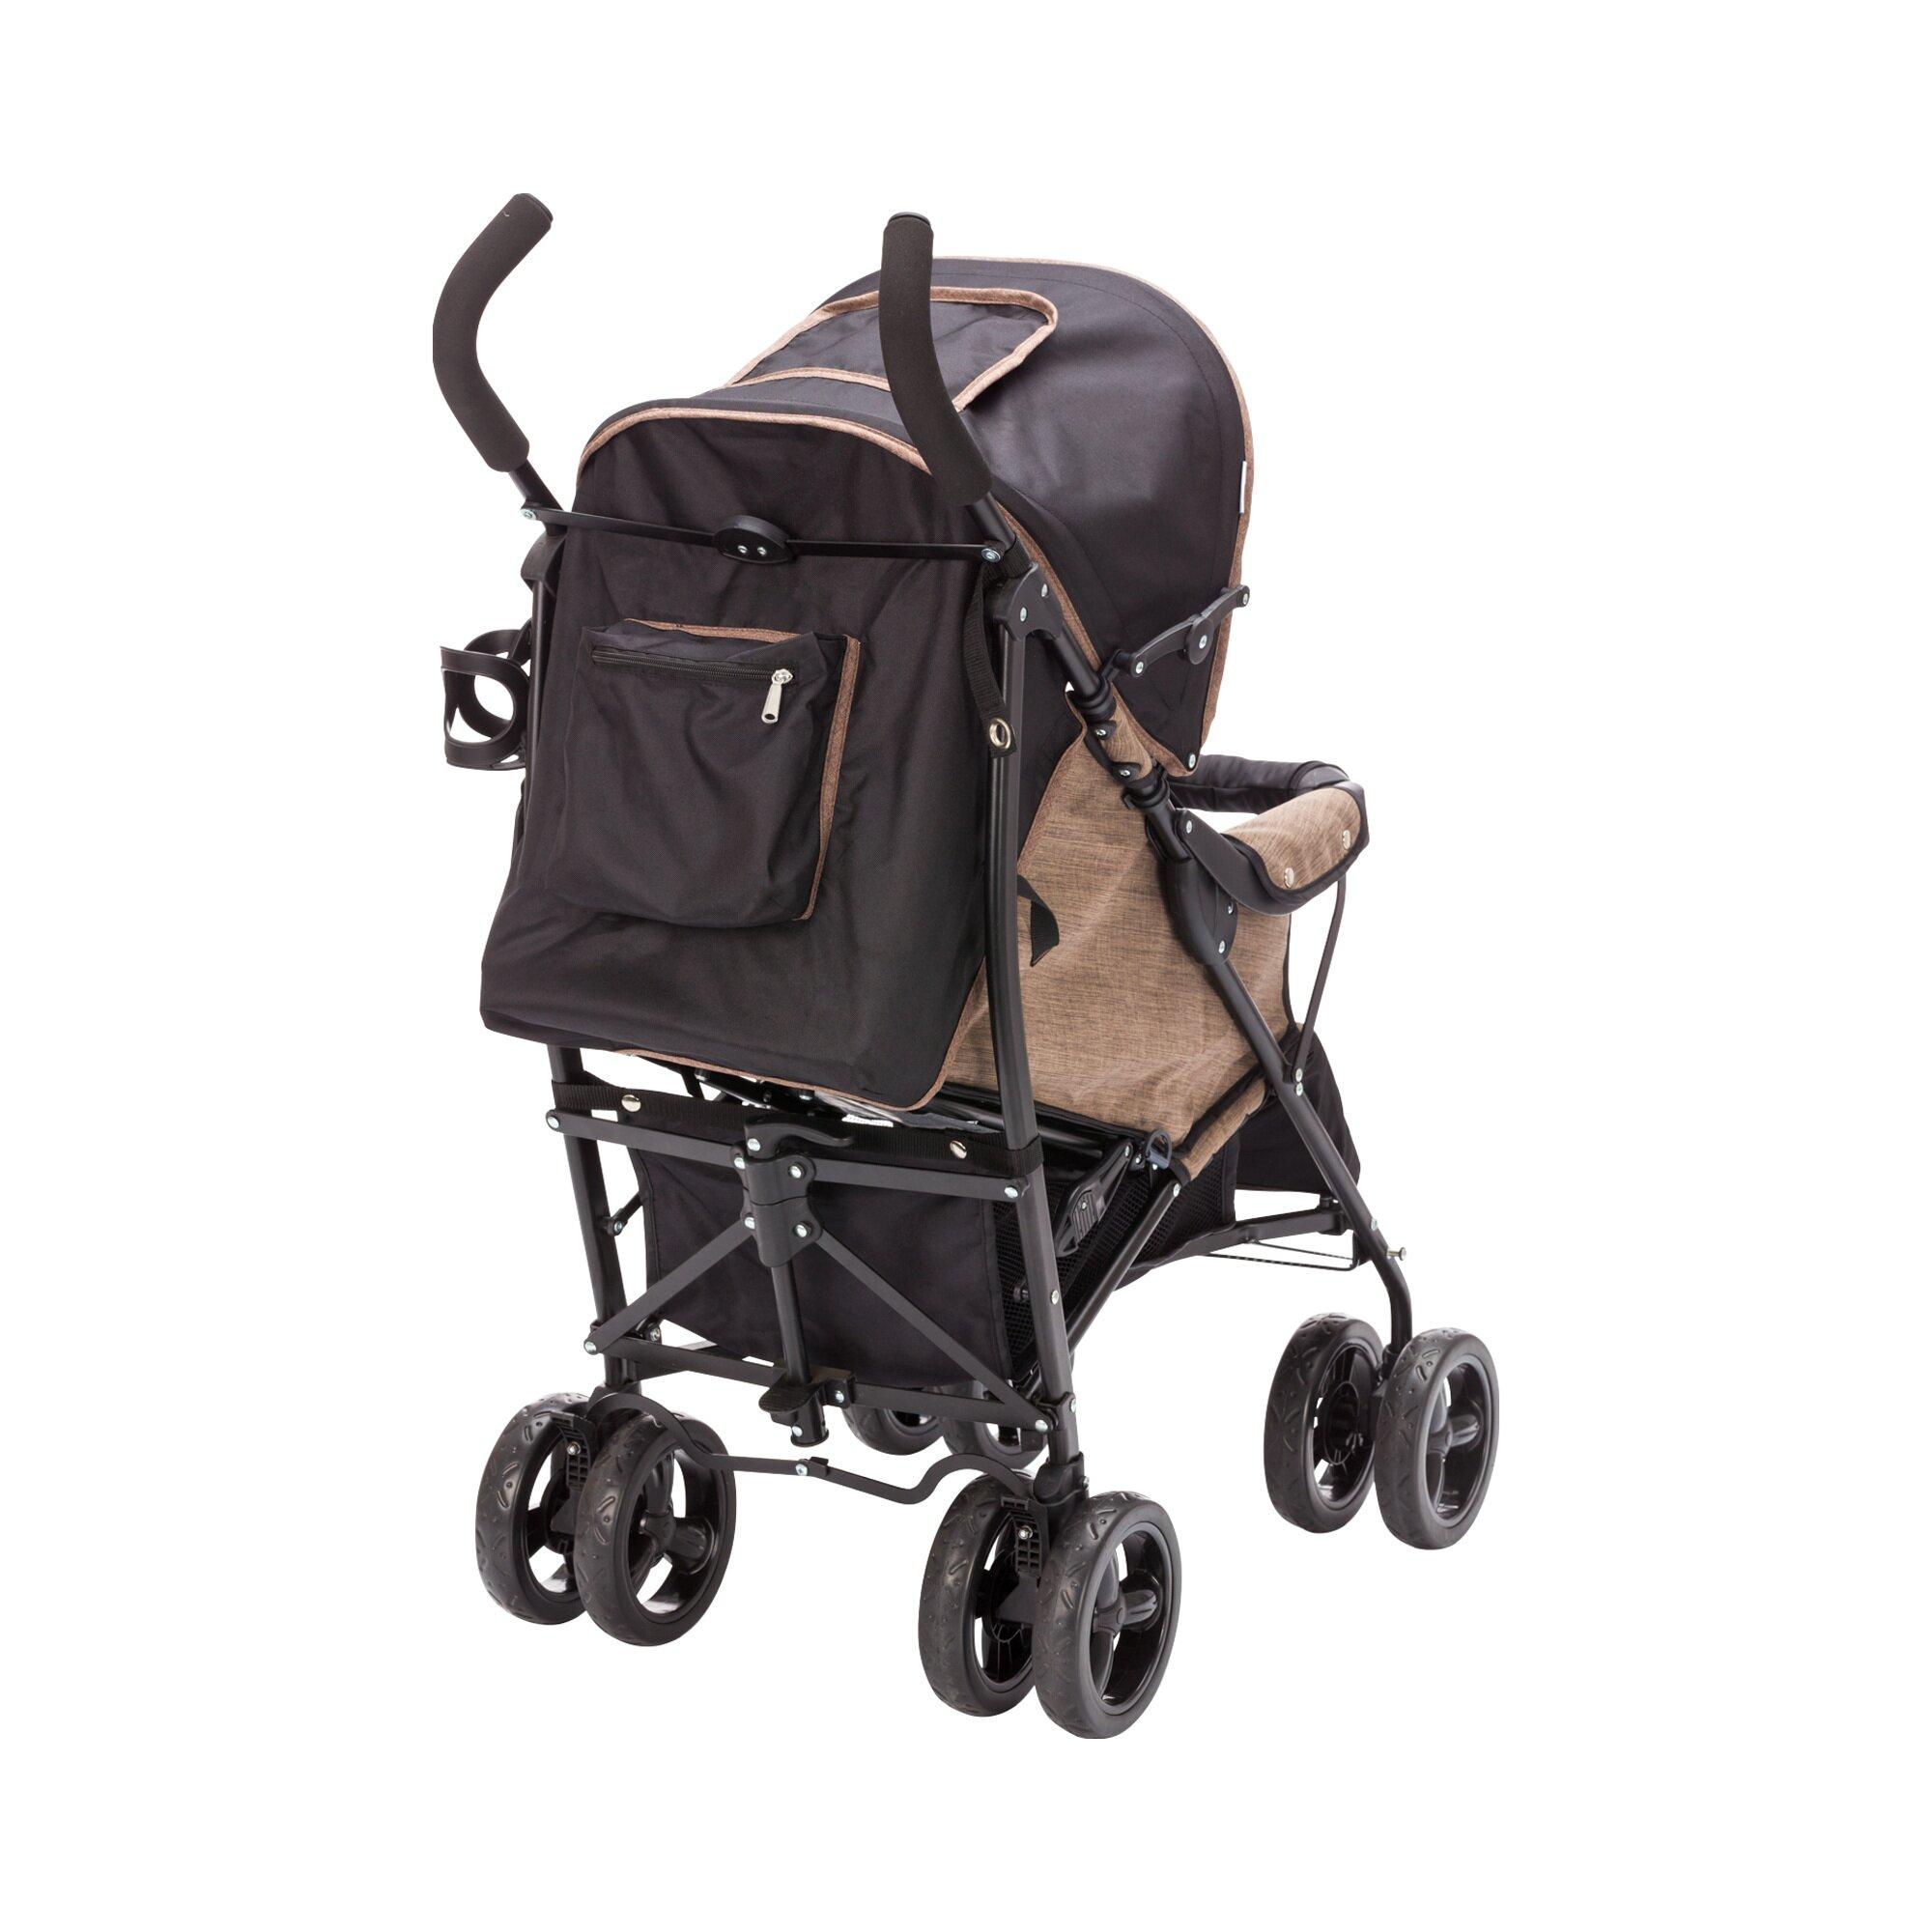 babycab-elias-buggy-mit-liegefunktion-braun